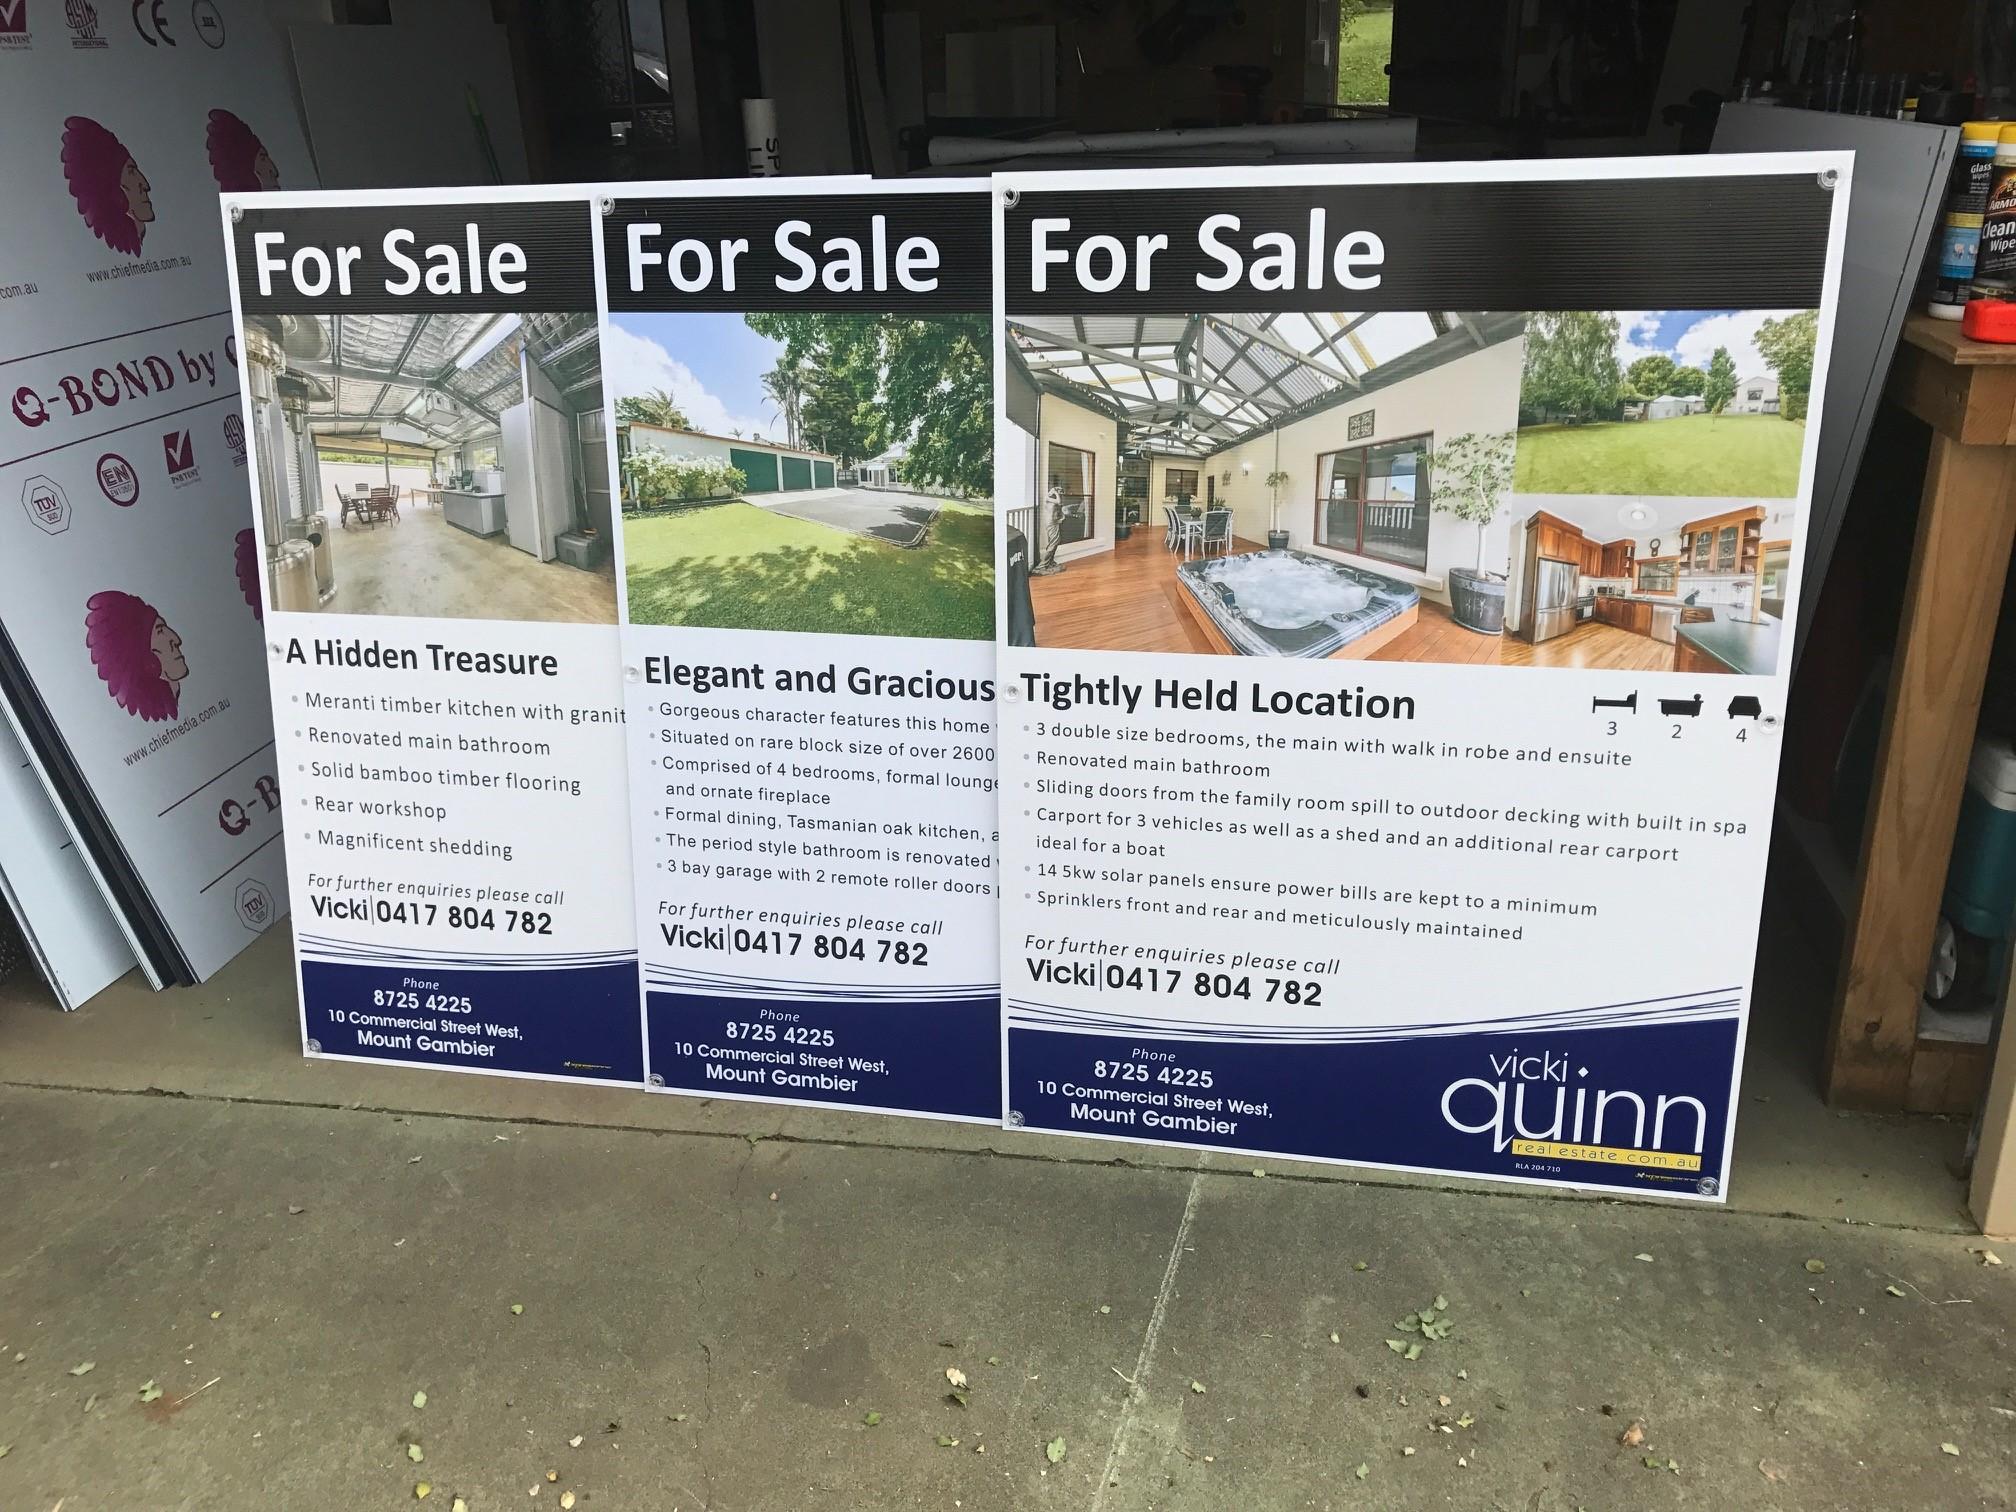 Vicki Quinn Real Estate Corflute Signs